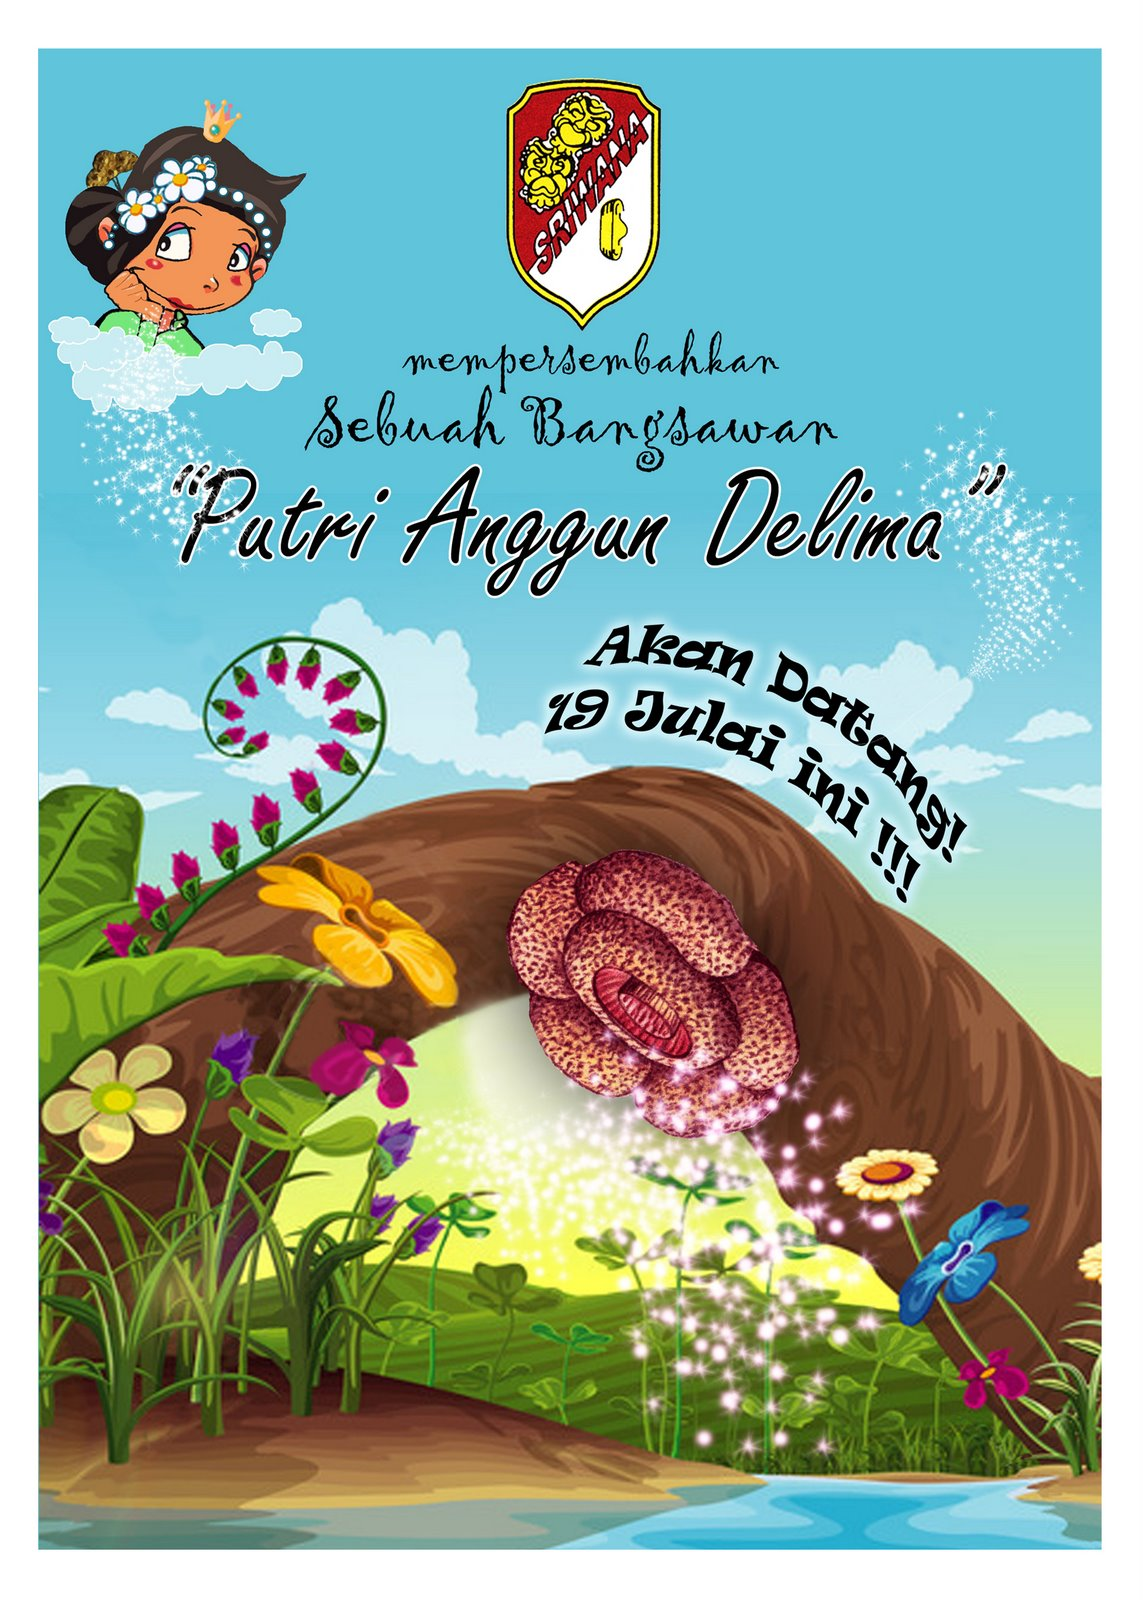 Dialog Drama Bahasa Jawa 5 Orang